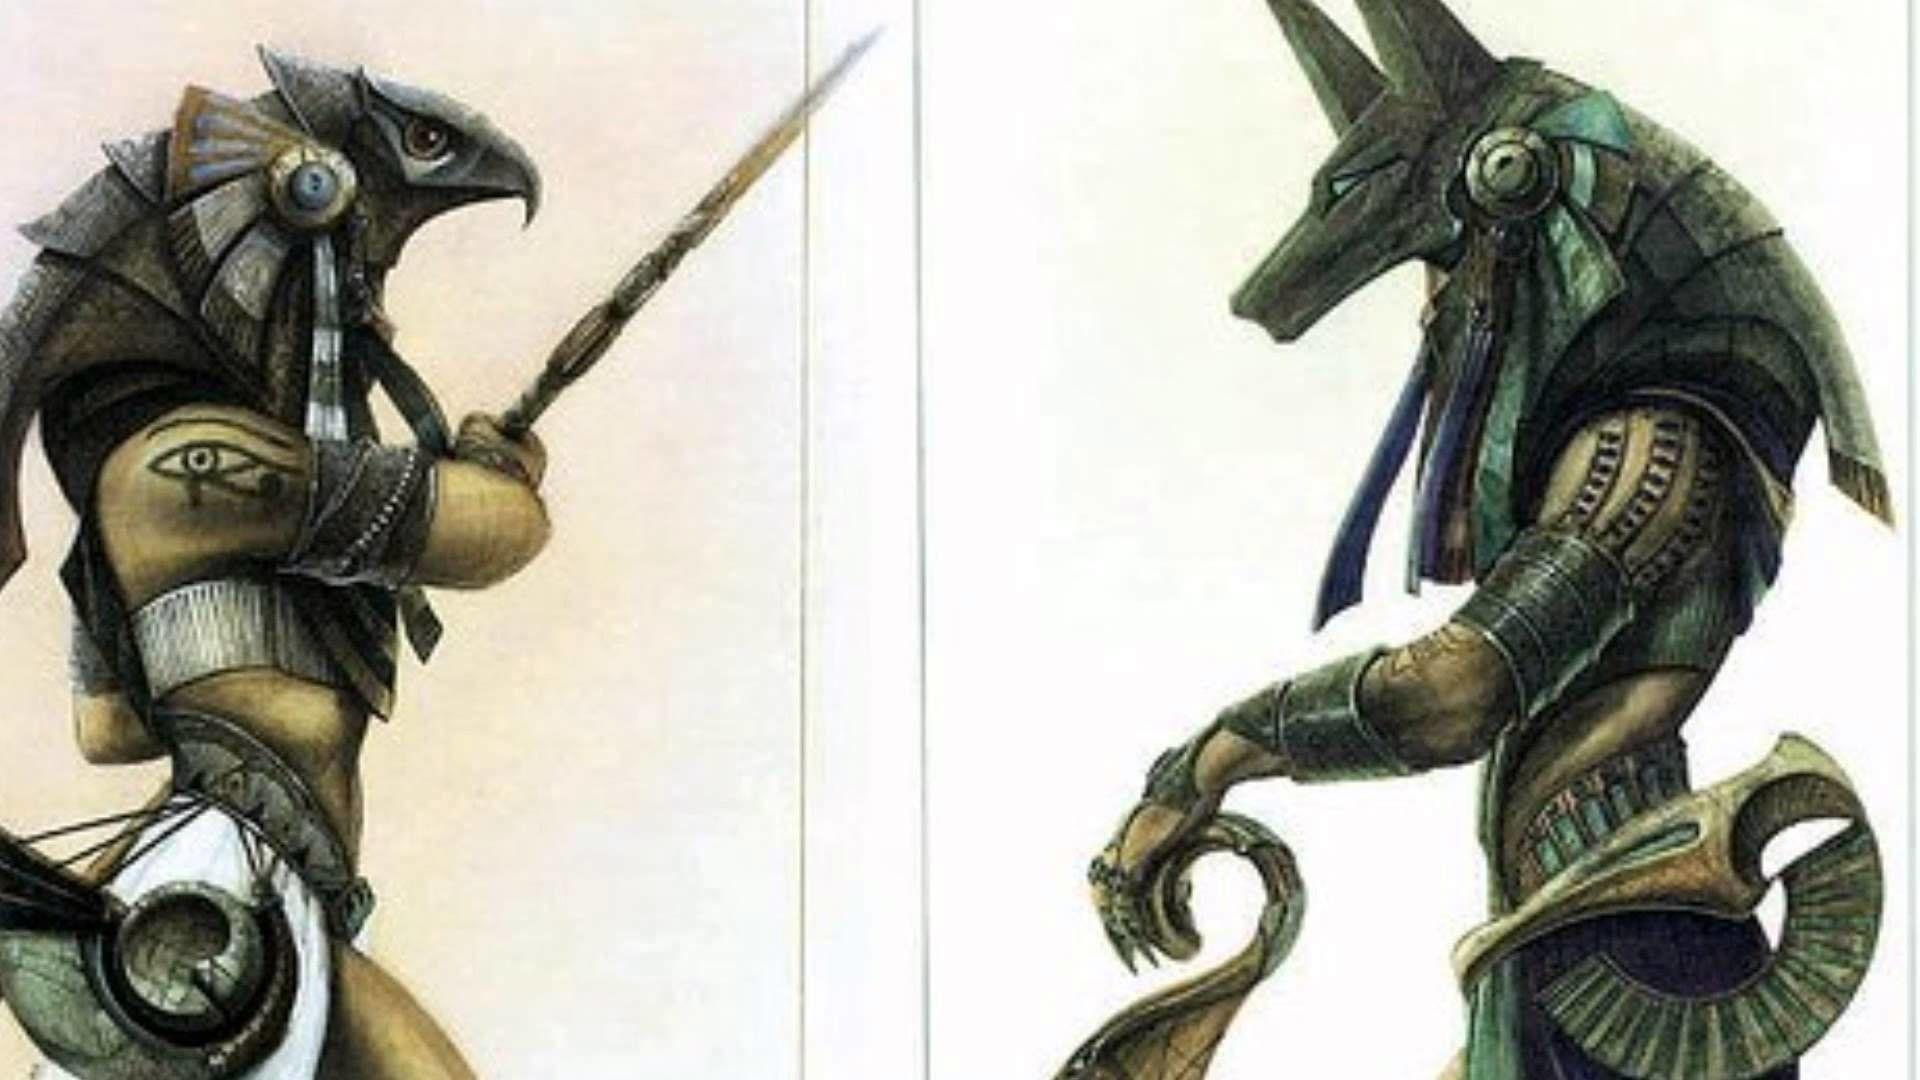 Egypt Warrior Illustration Anubis Pyramid Fantasy Art: Top Free 4K Anubis Backgrounds